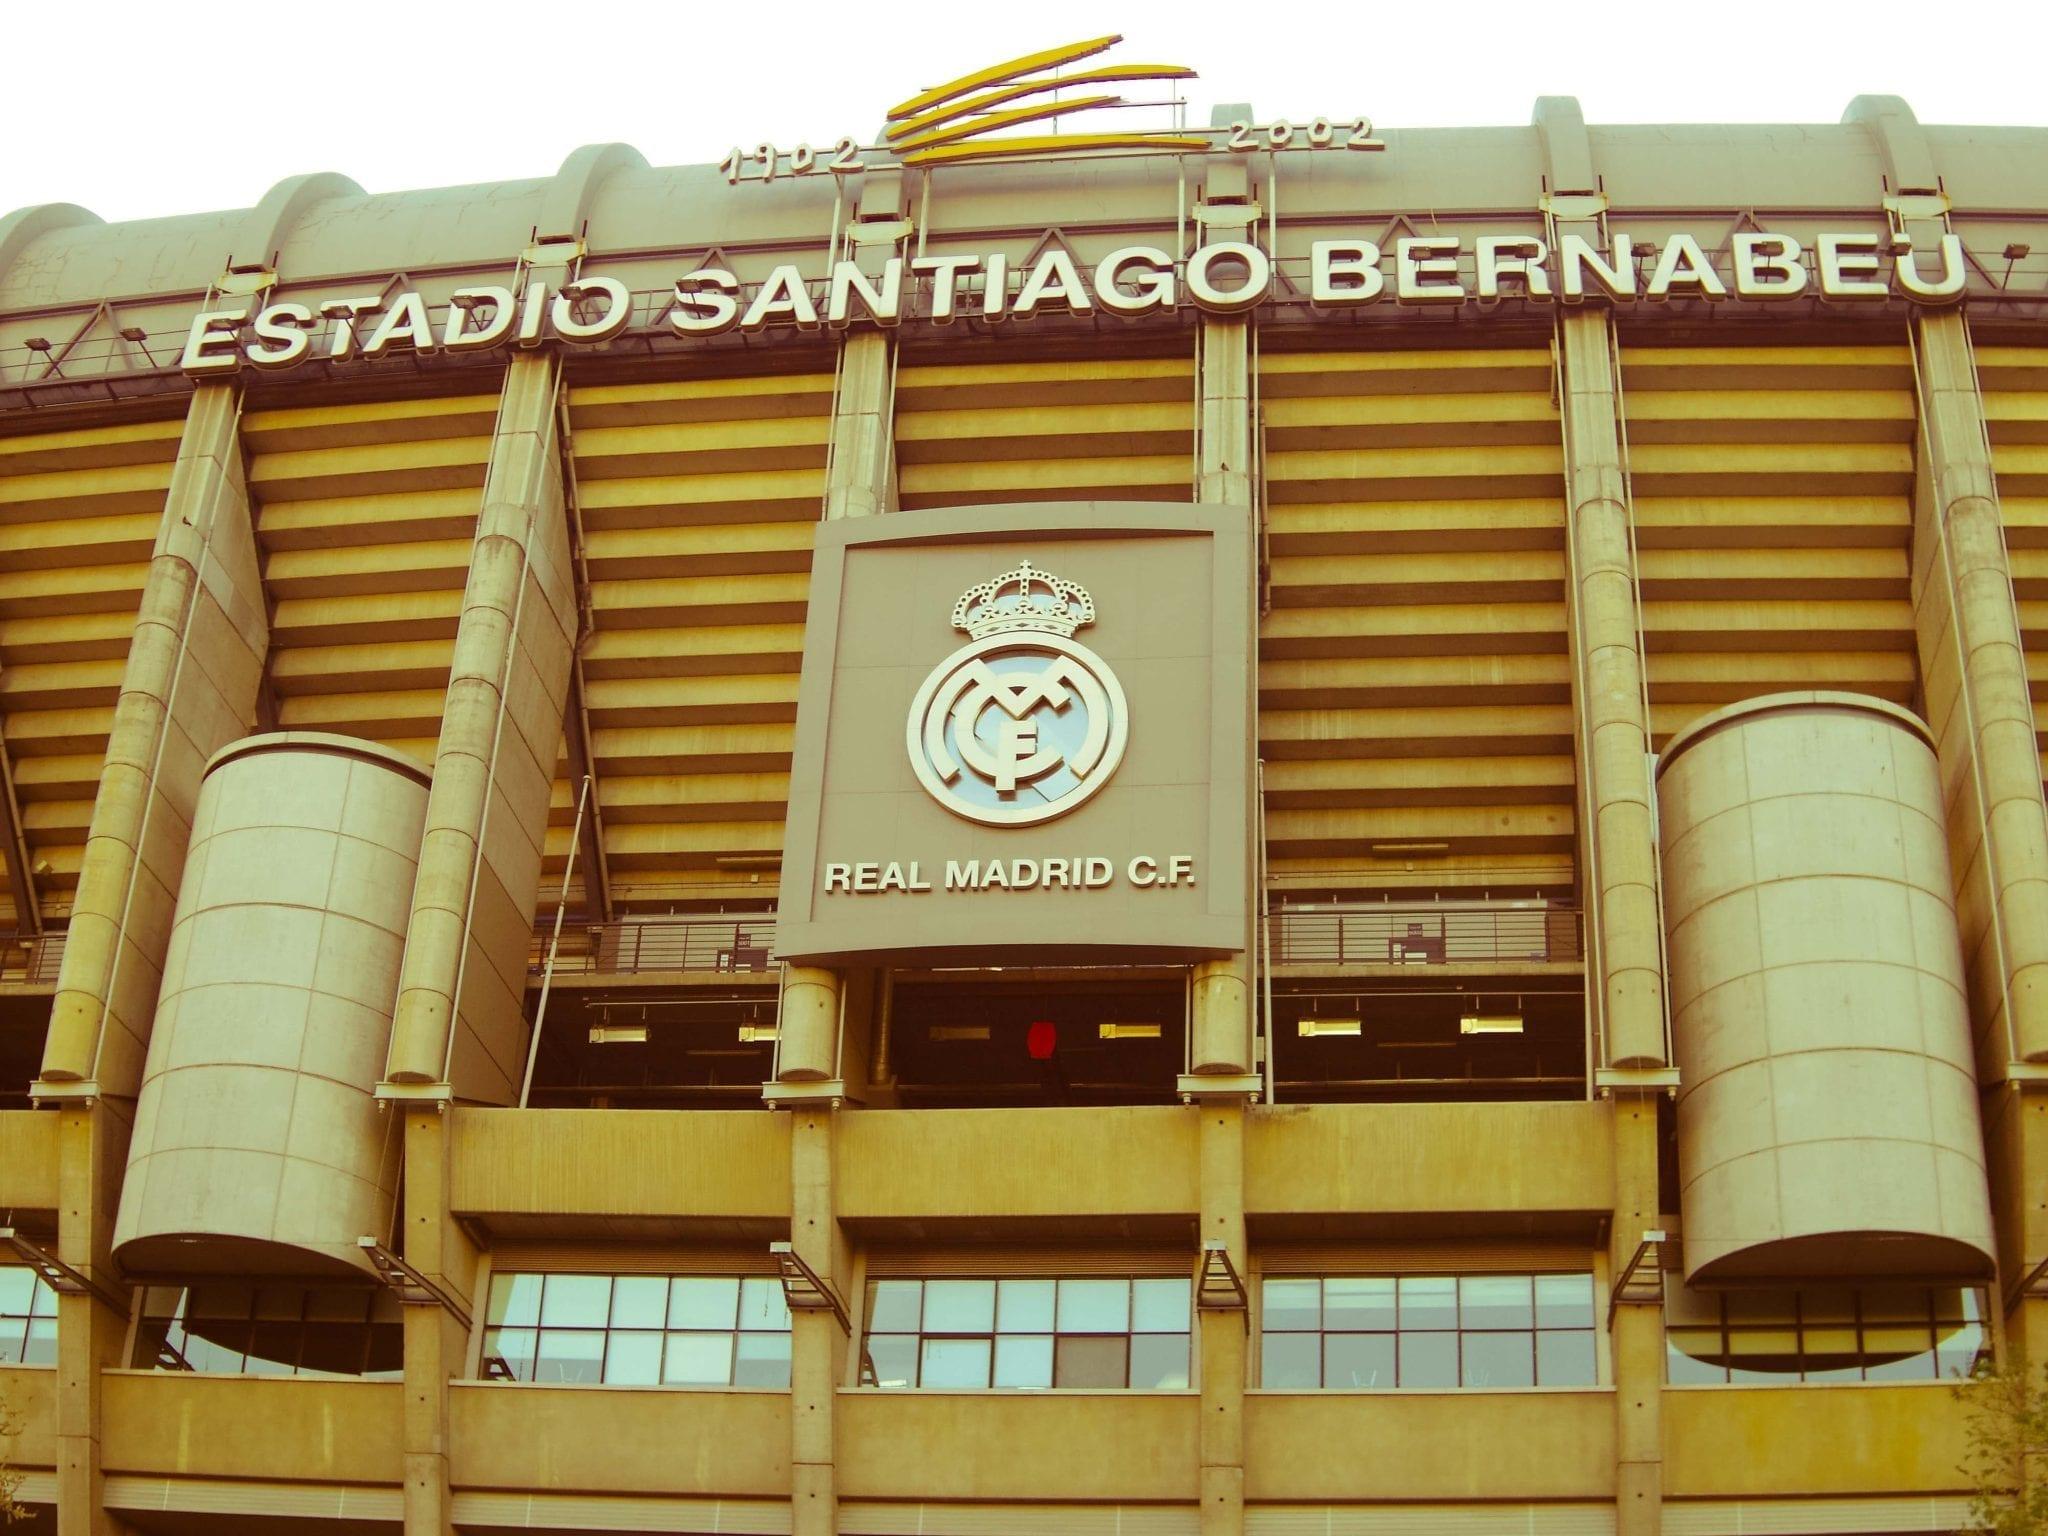 Real Madrid Santiago Bernabeu stadium escudo Castellana